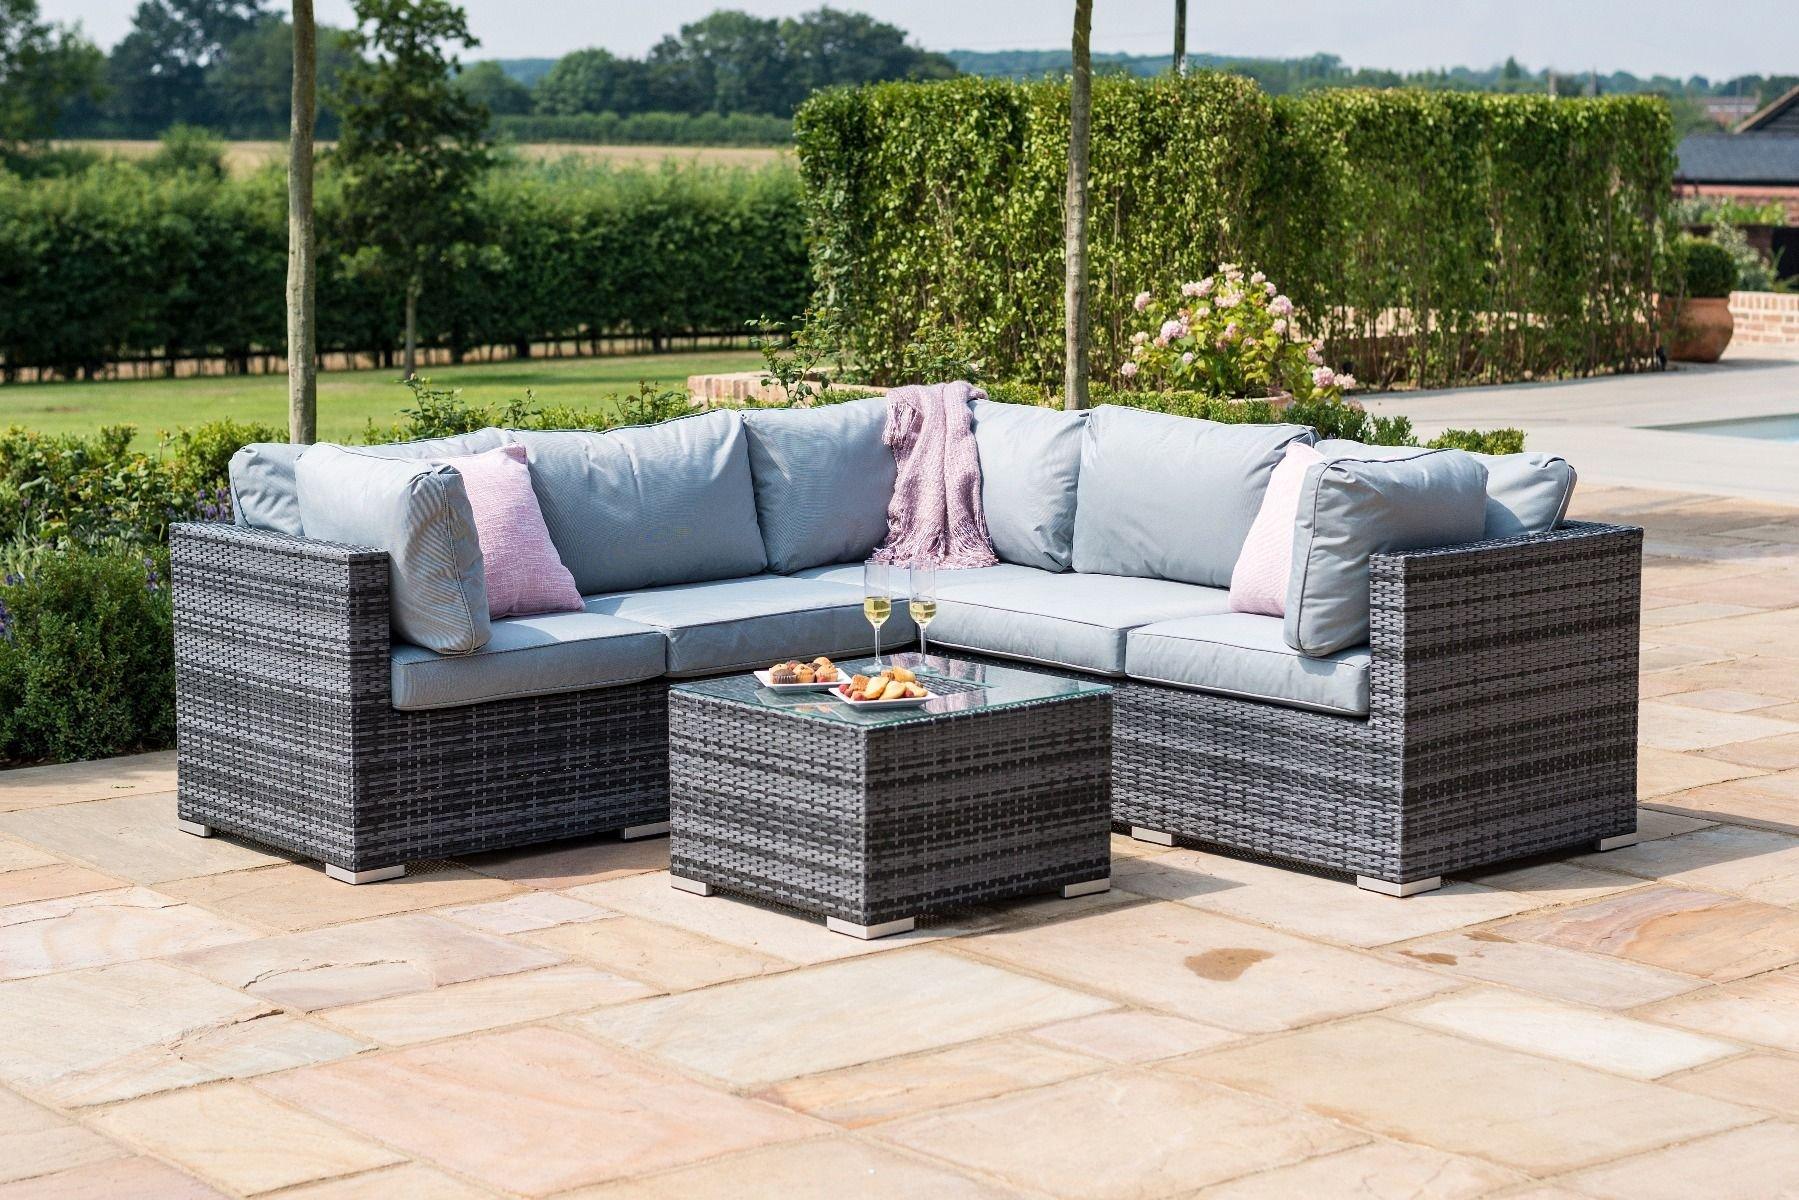 Maze Rattan Porto Corner Sofa Set Grey The Clearance Zone